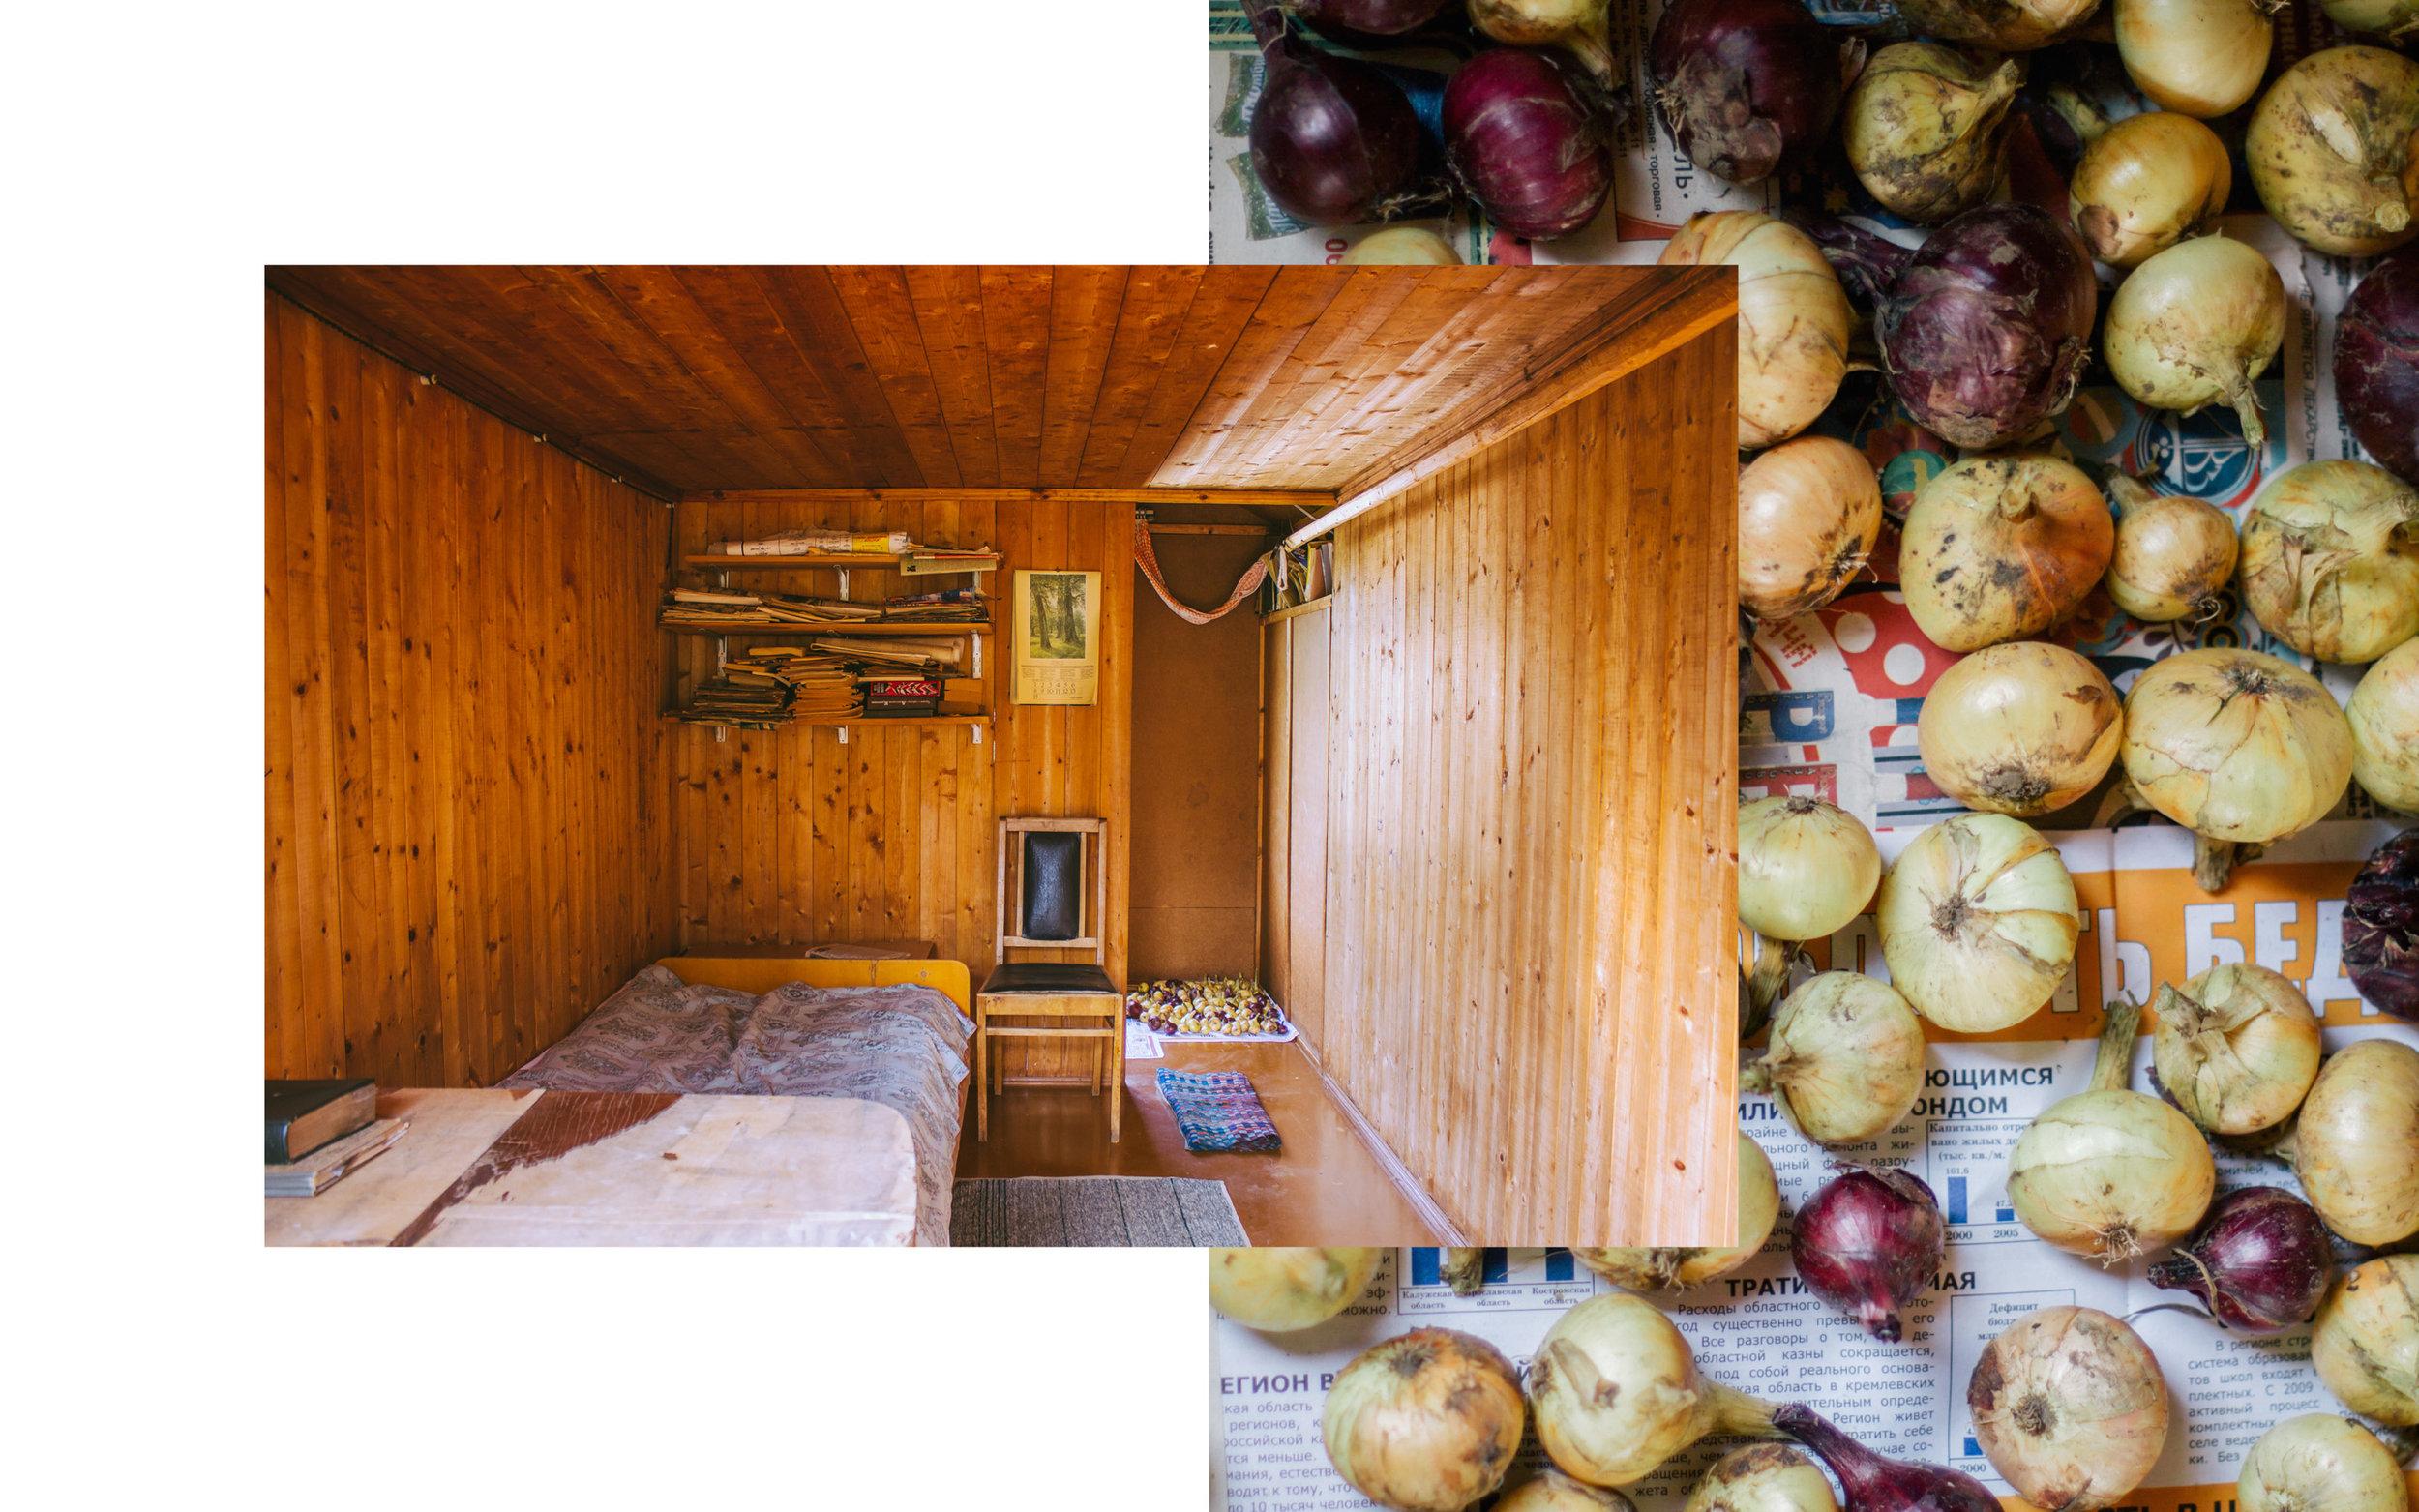 Kovtun_018_Russia_Photo_Book.jpg